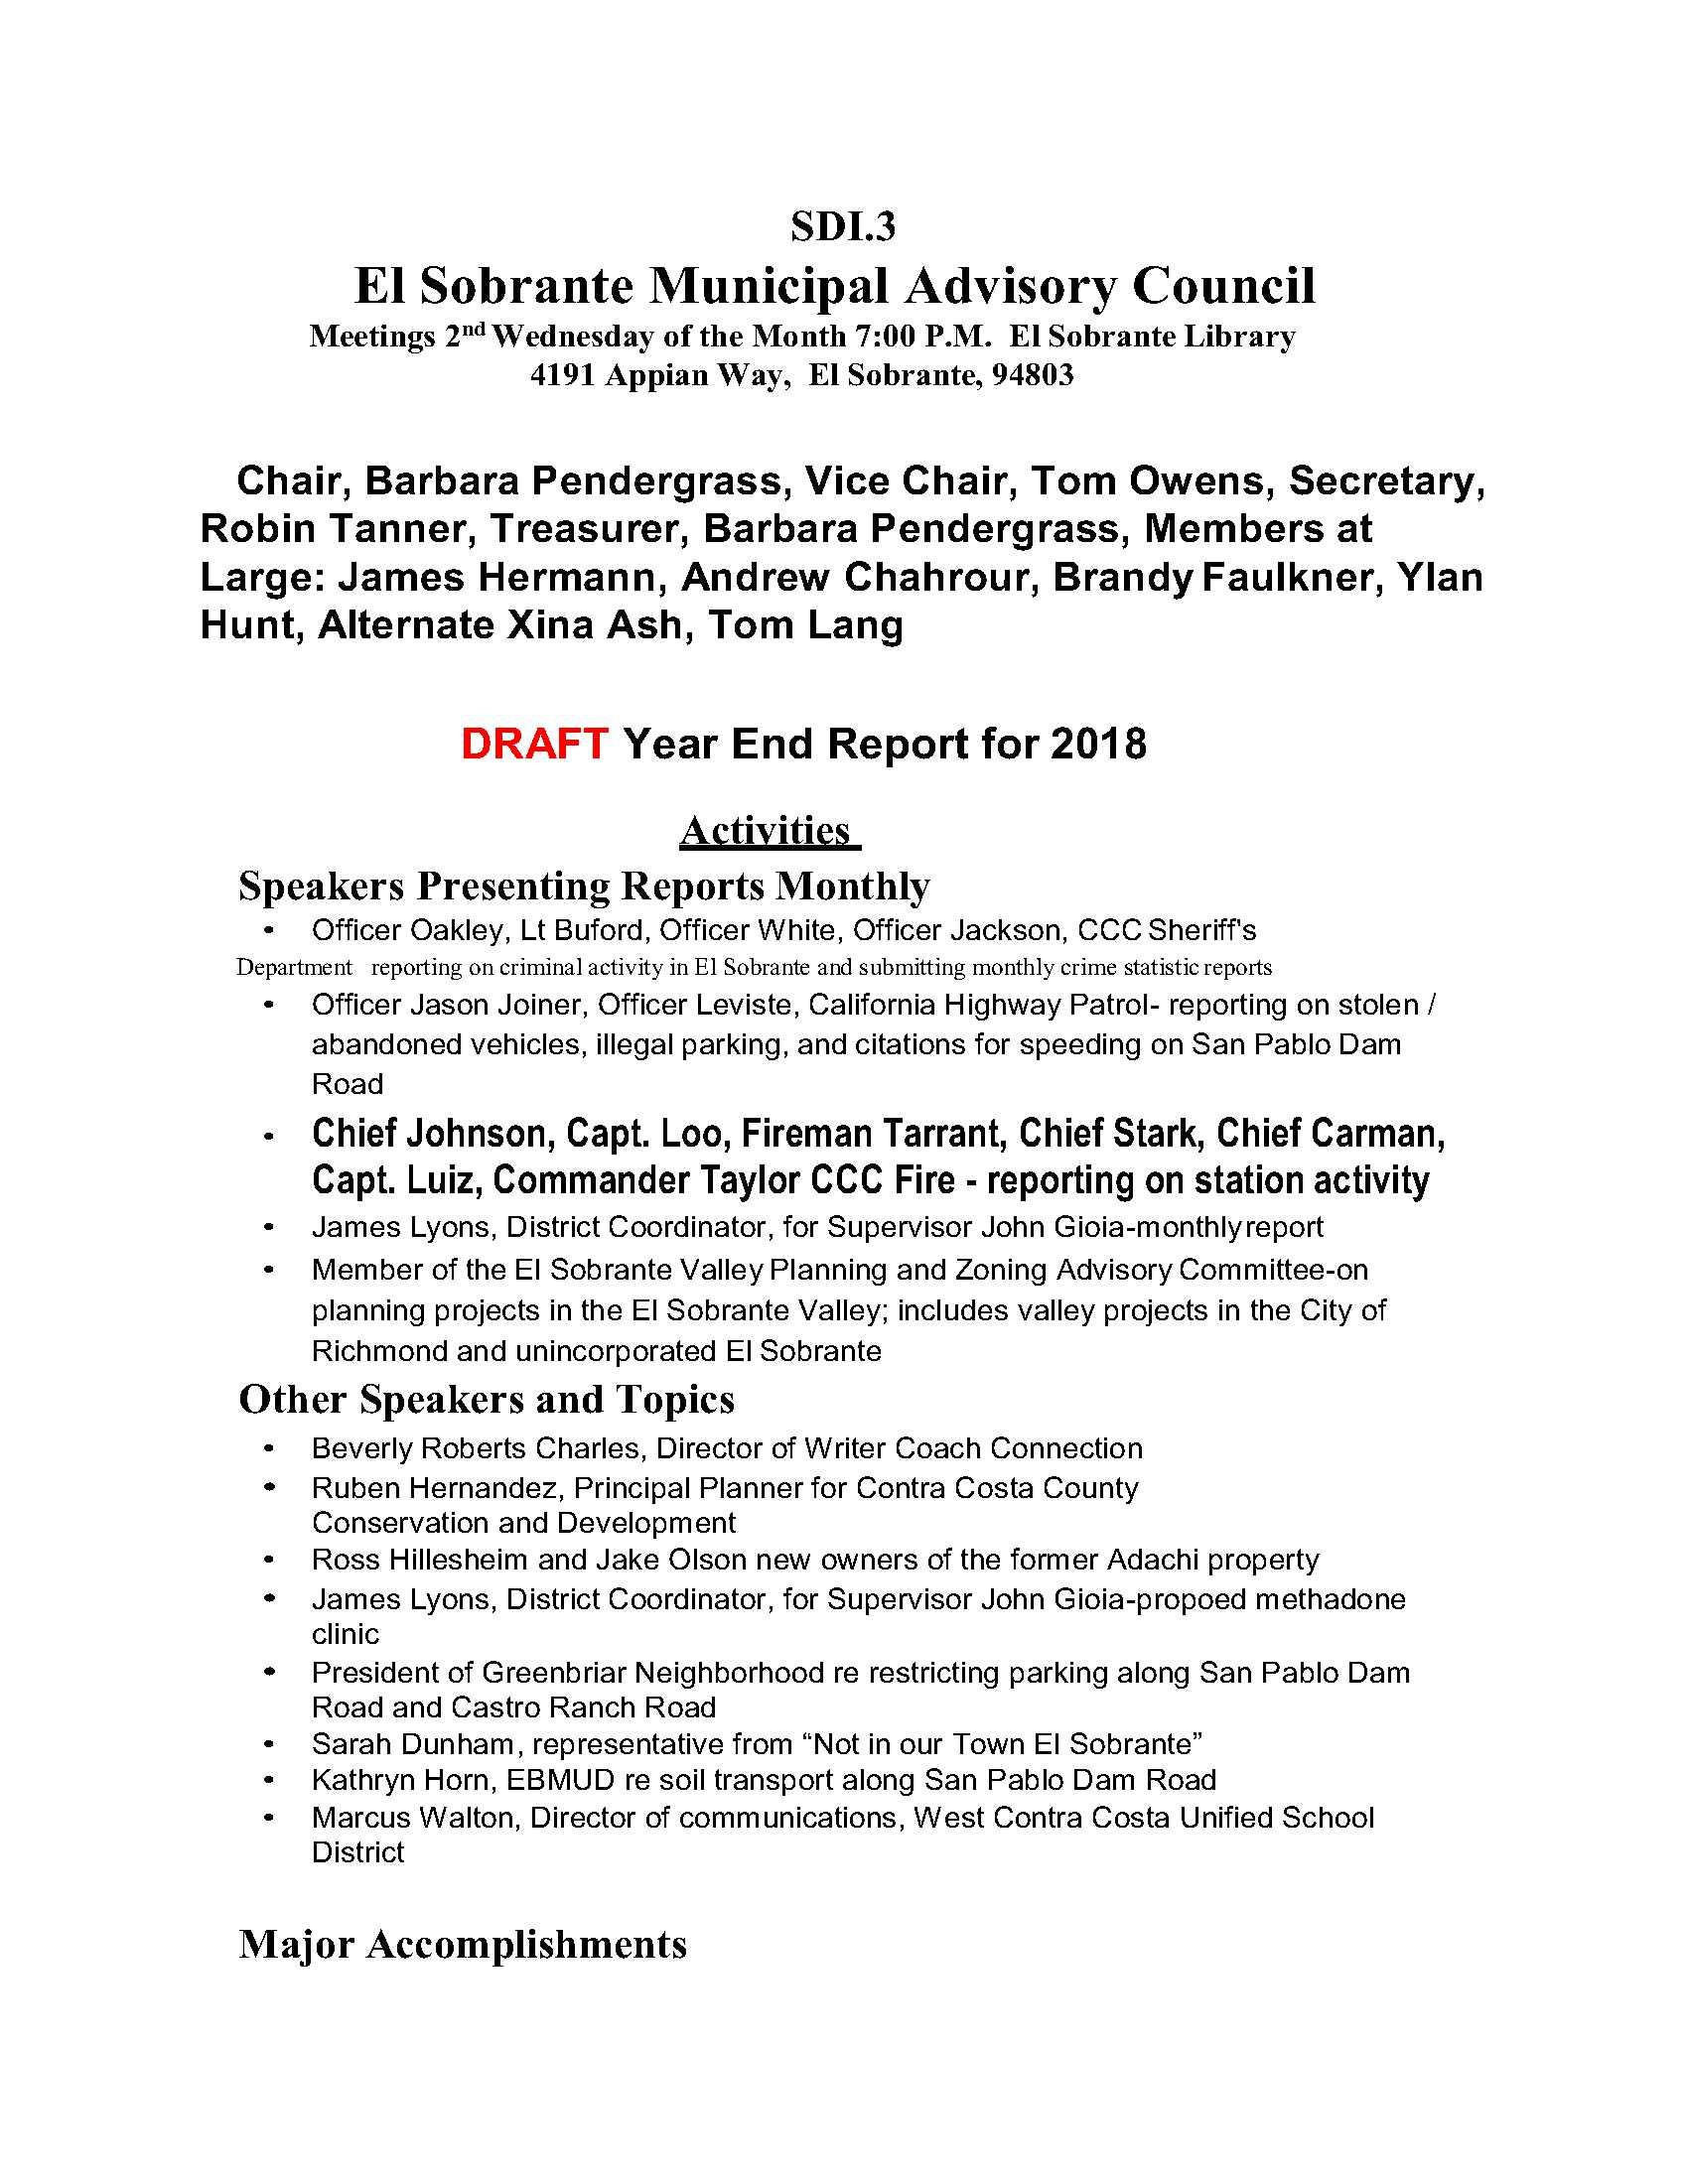 ESMAC Agenda 12.13.2018 (51 Pages)_23.jpg